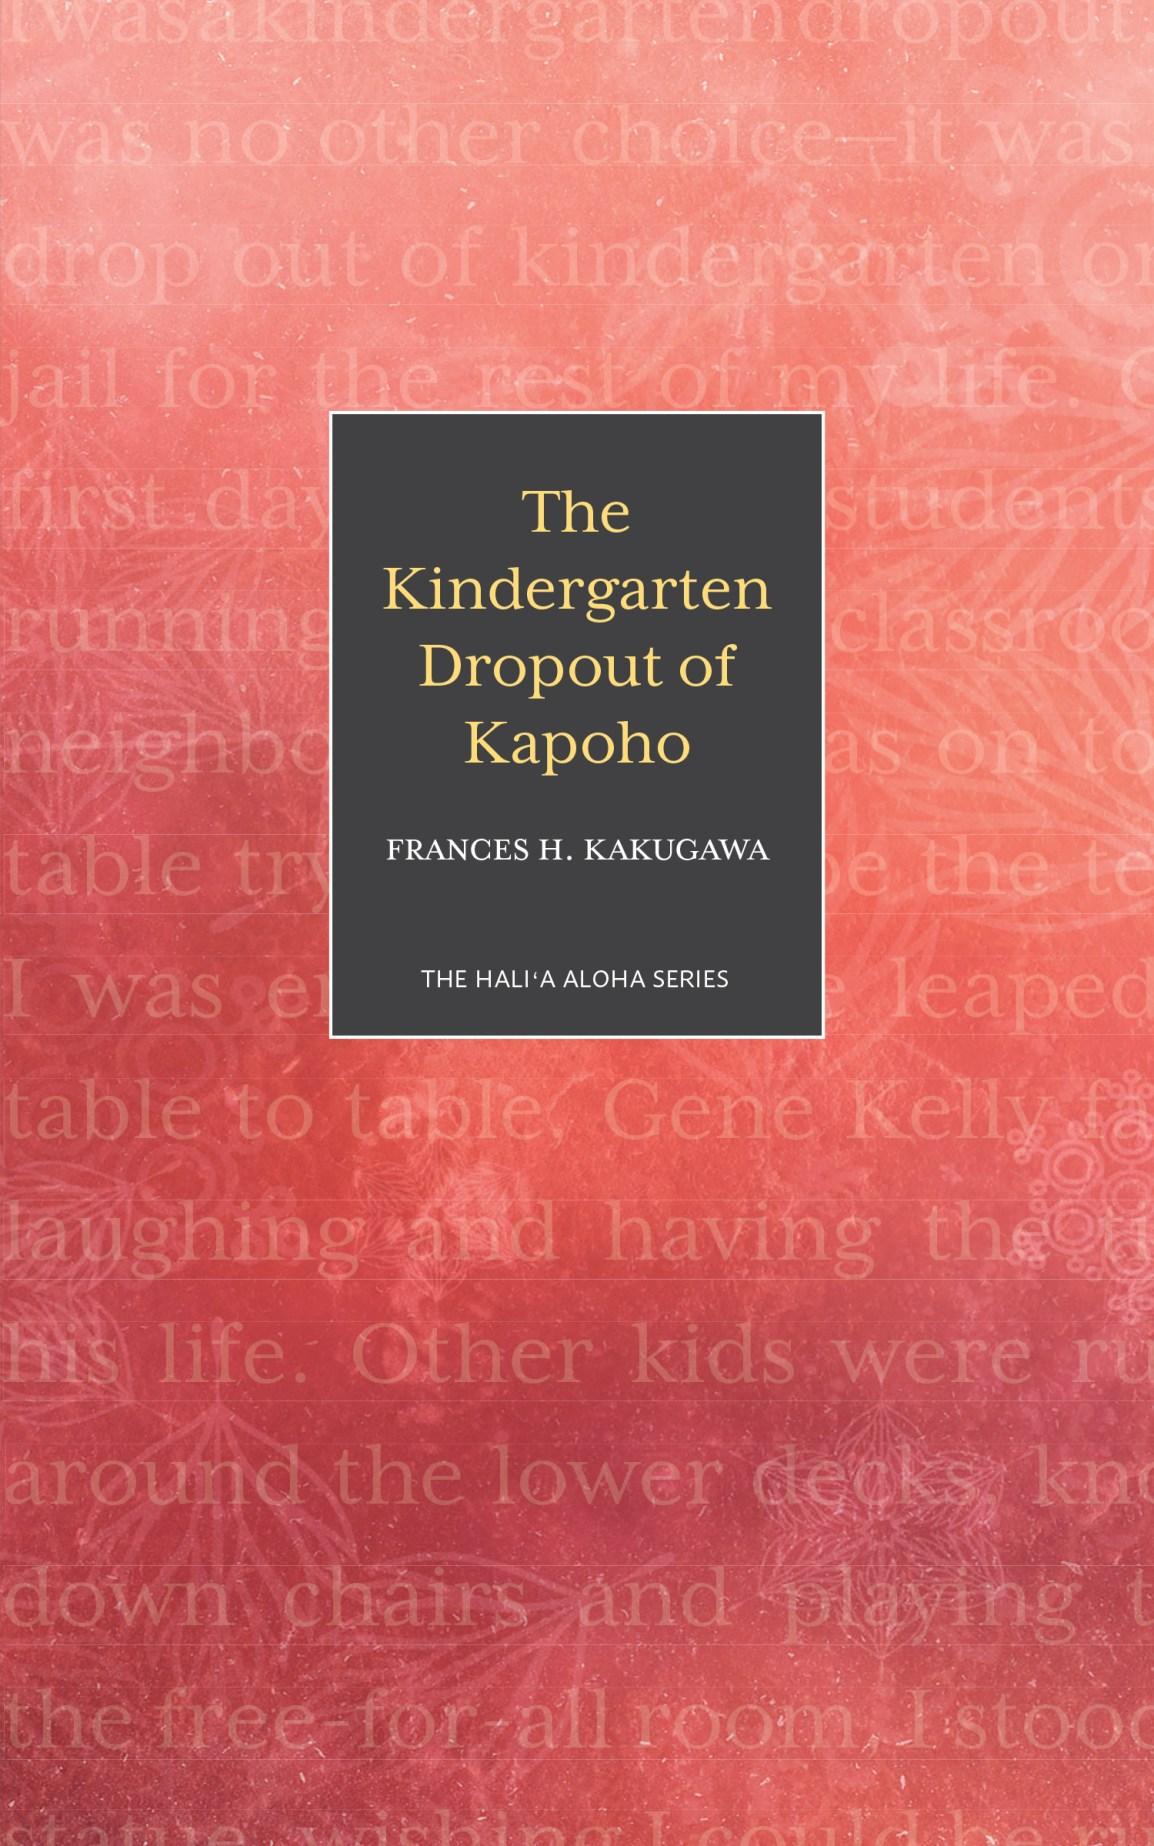 The Kindergarten Dropout of Kapoho by Frances Kakugawa